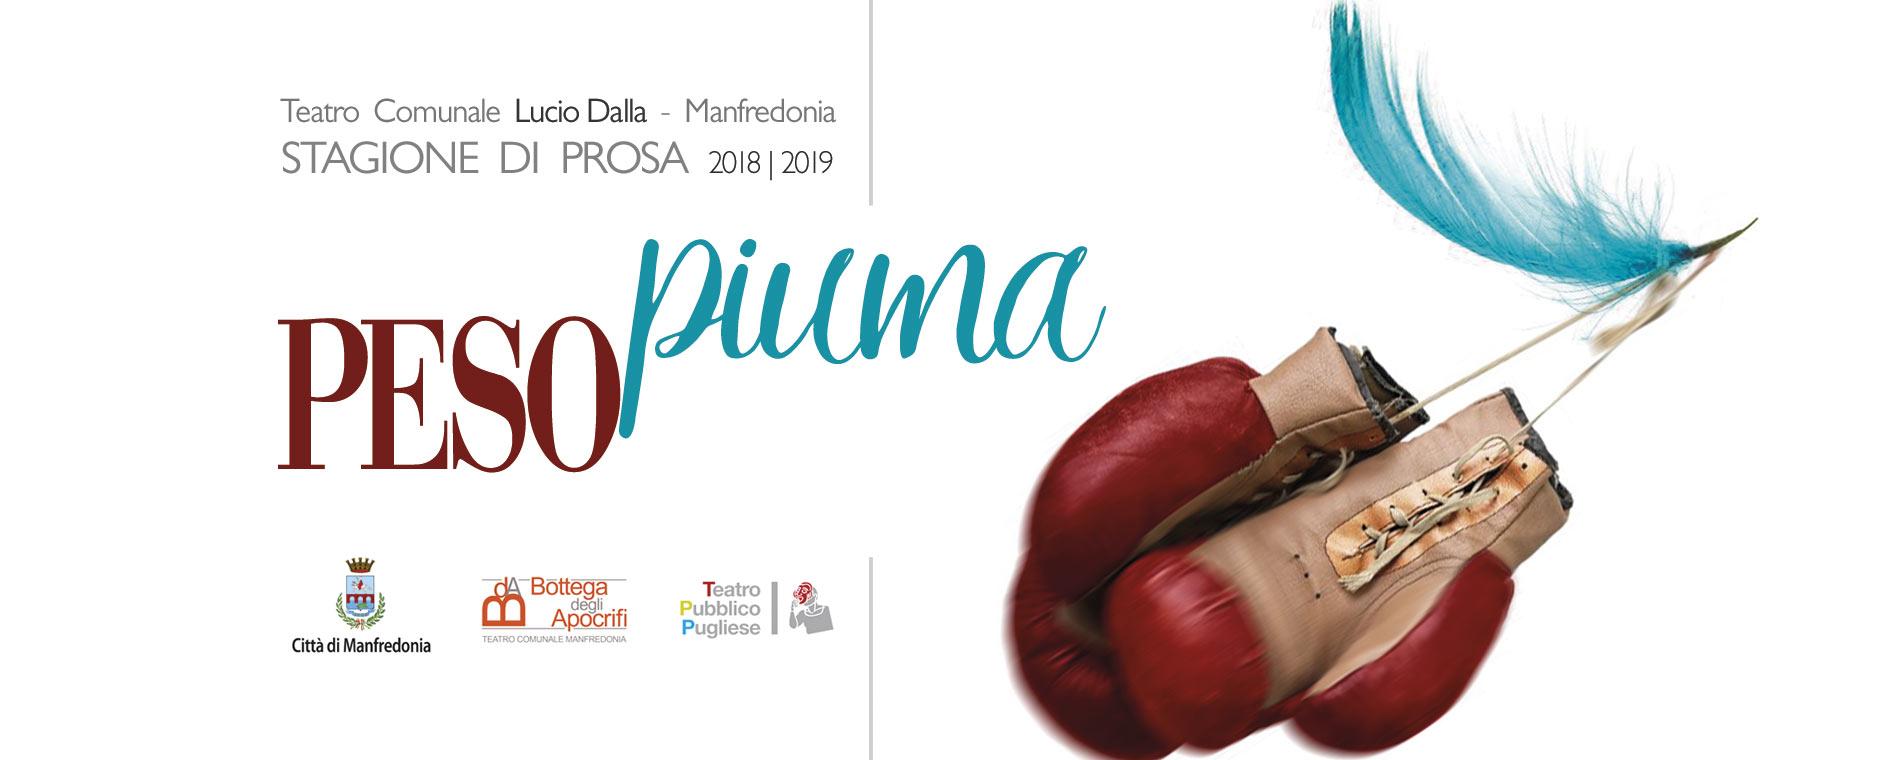 #pesopiuma La stagione teatrale 2018|2019